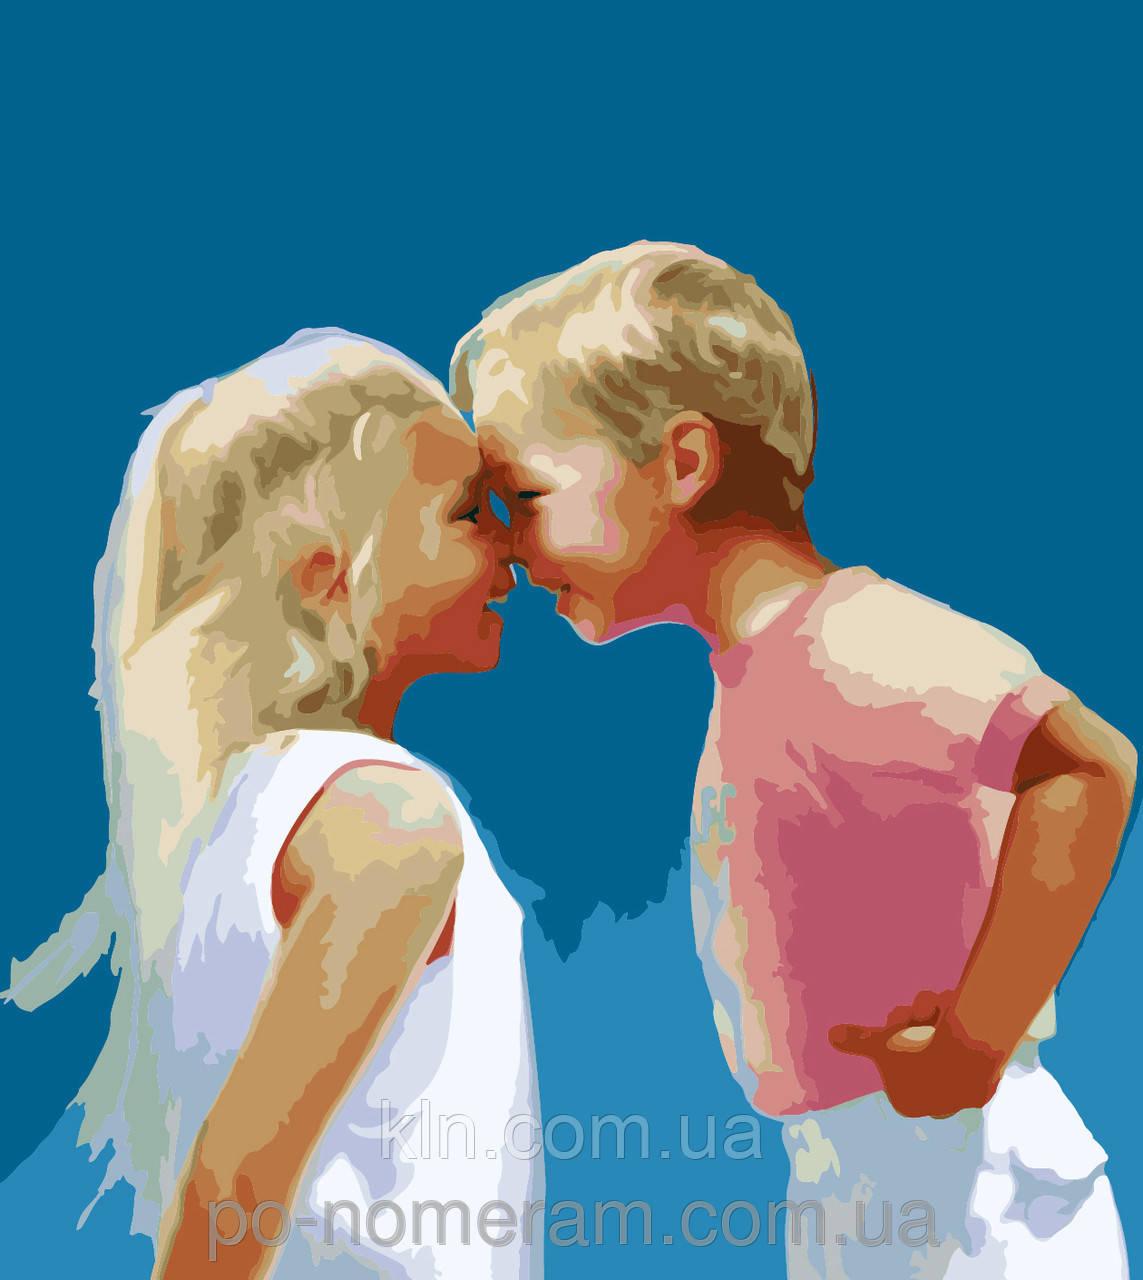 Картина по номерам Menglei Детская дружба MG1026 40 х 50 см